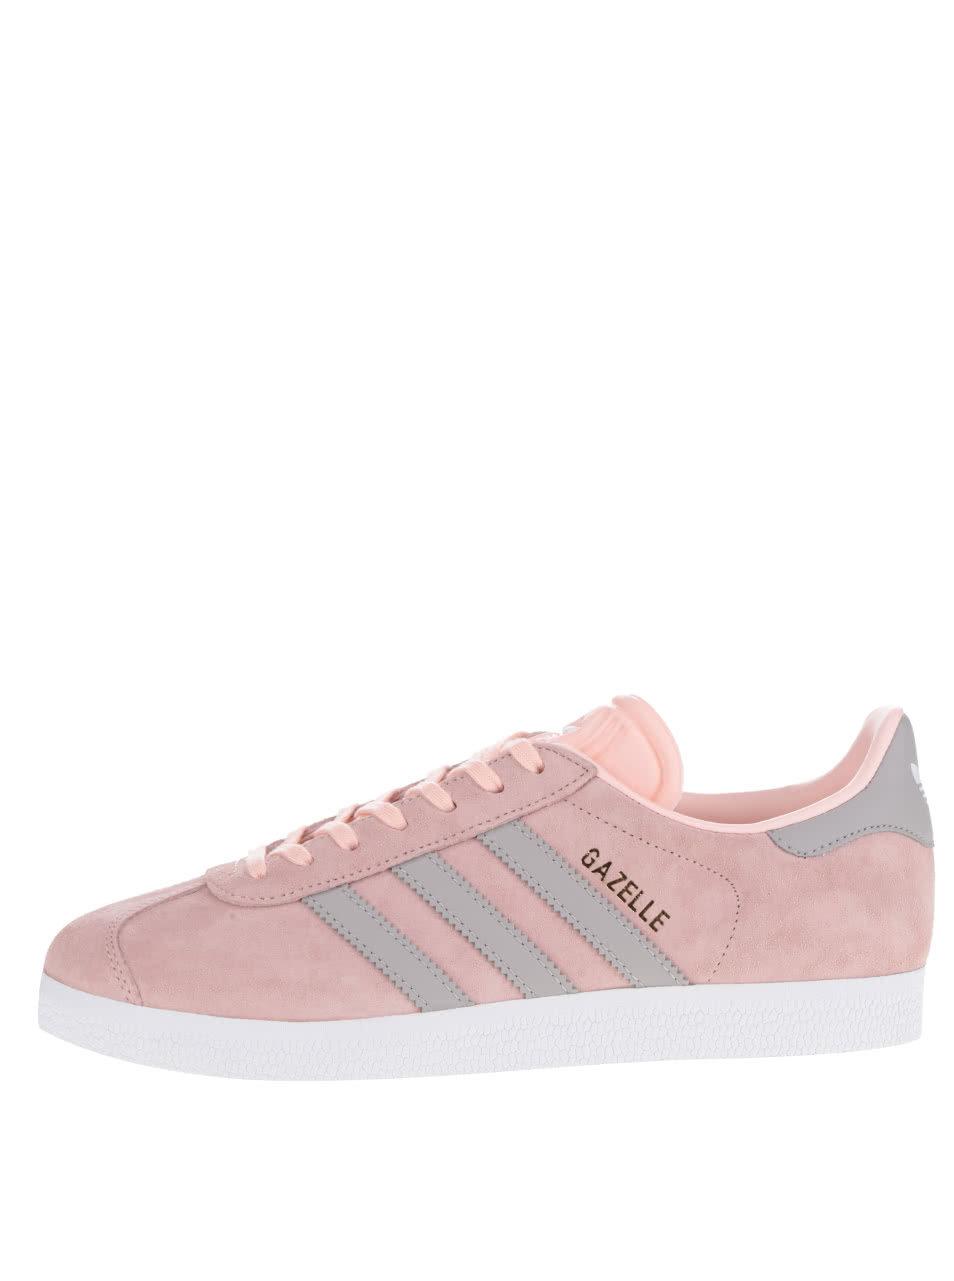 Světle růžové dámské semišové tenisky adidas Originals Gazelle ... bd2ca11a5ab